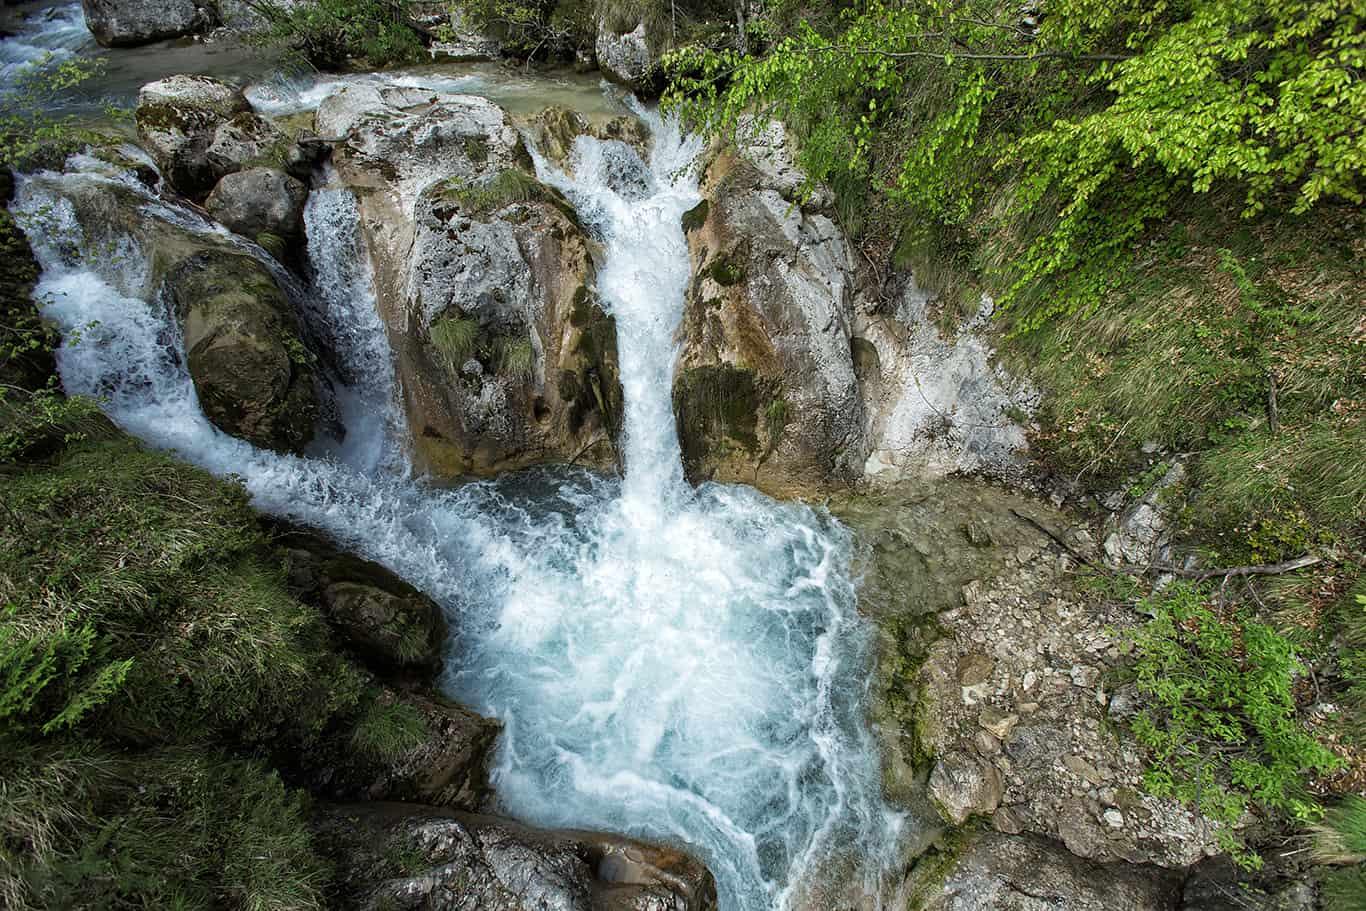 Tscheppaschlucht in Kärnten - Ausflugsziel Carnica Region Rosental Nähe Wörthersee